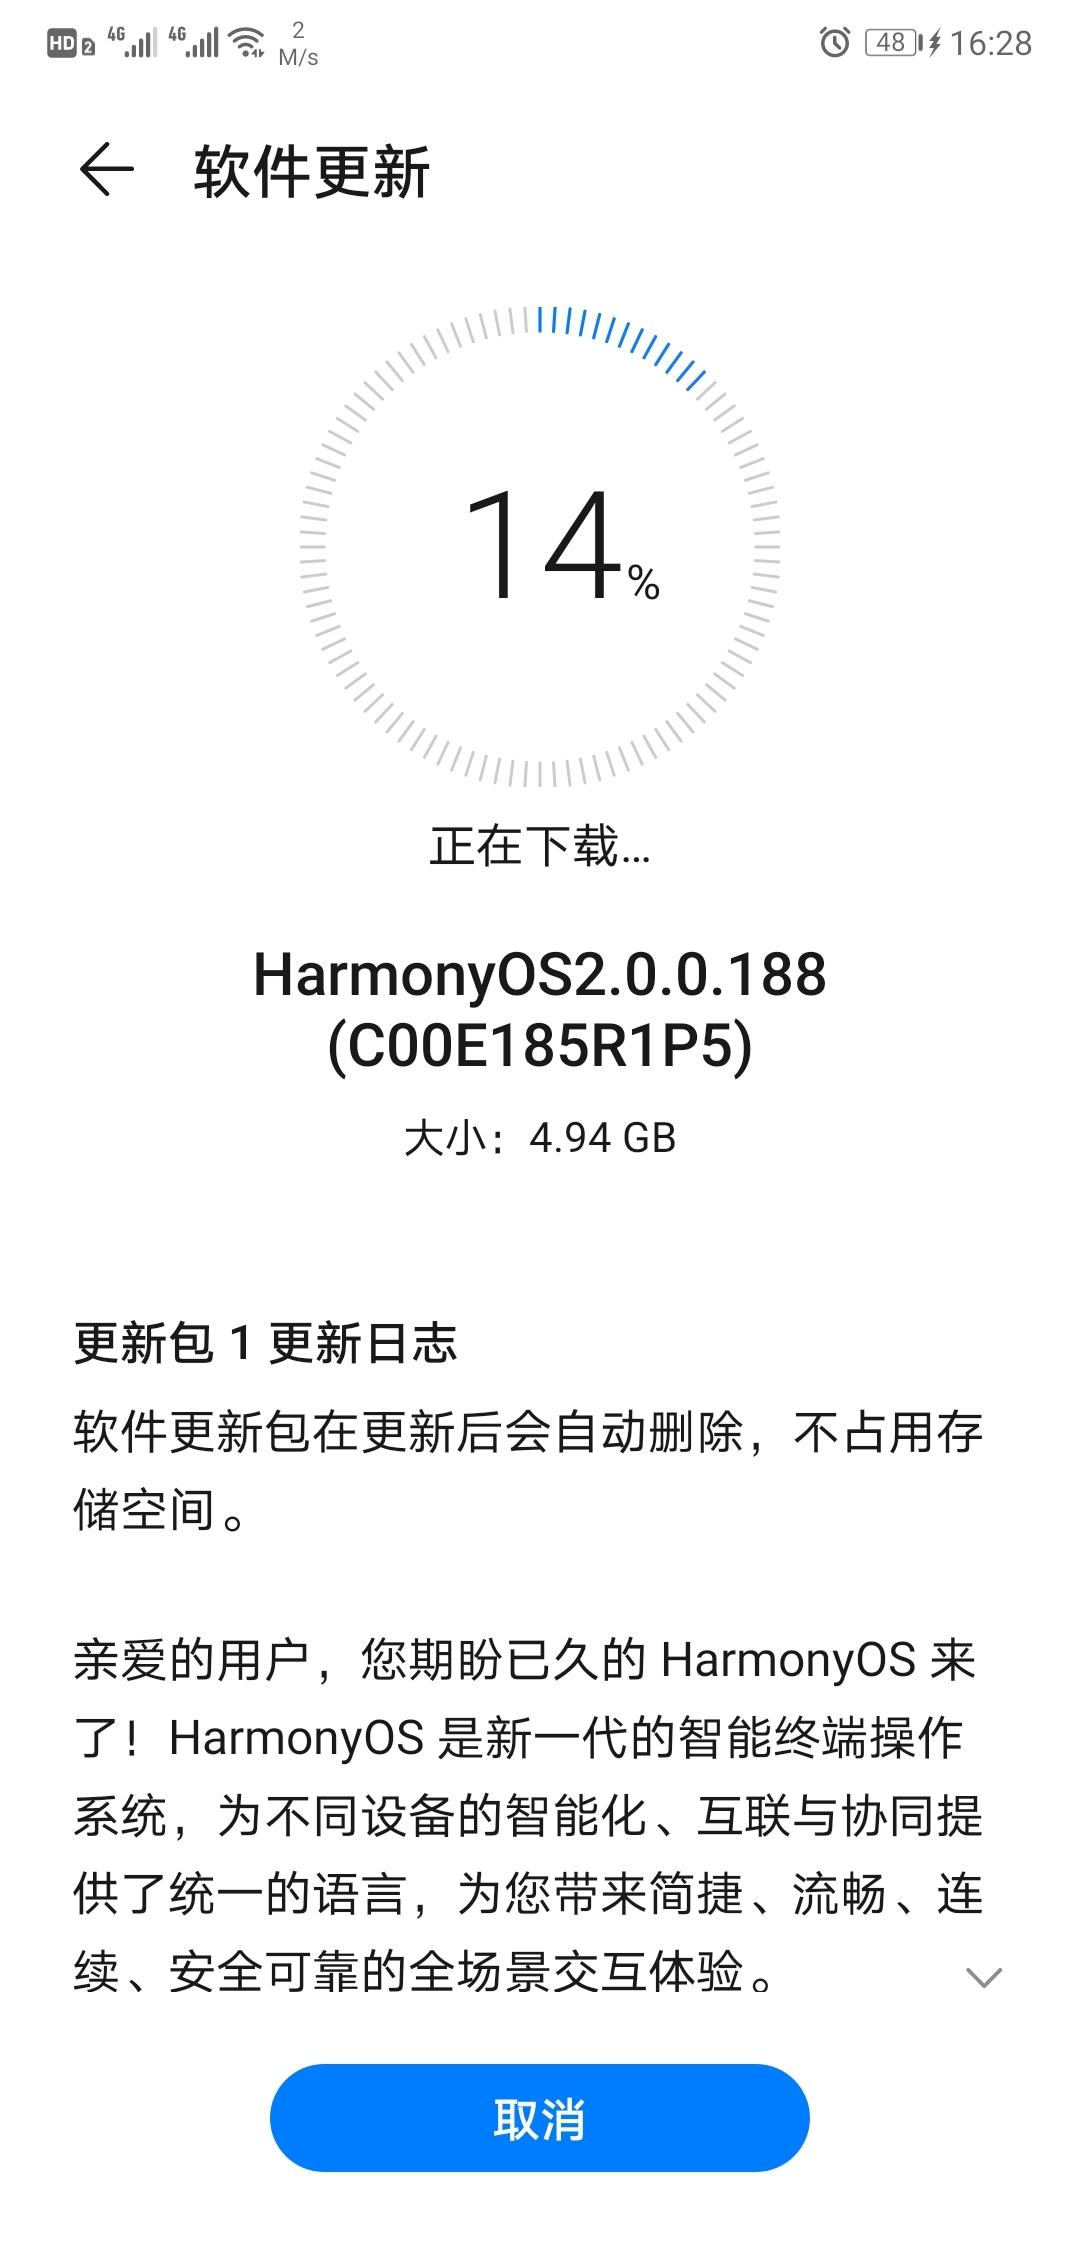 Screenshot_20210915_162825_com.huawei.android.hwouc.jpg